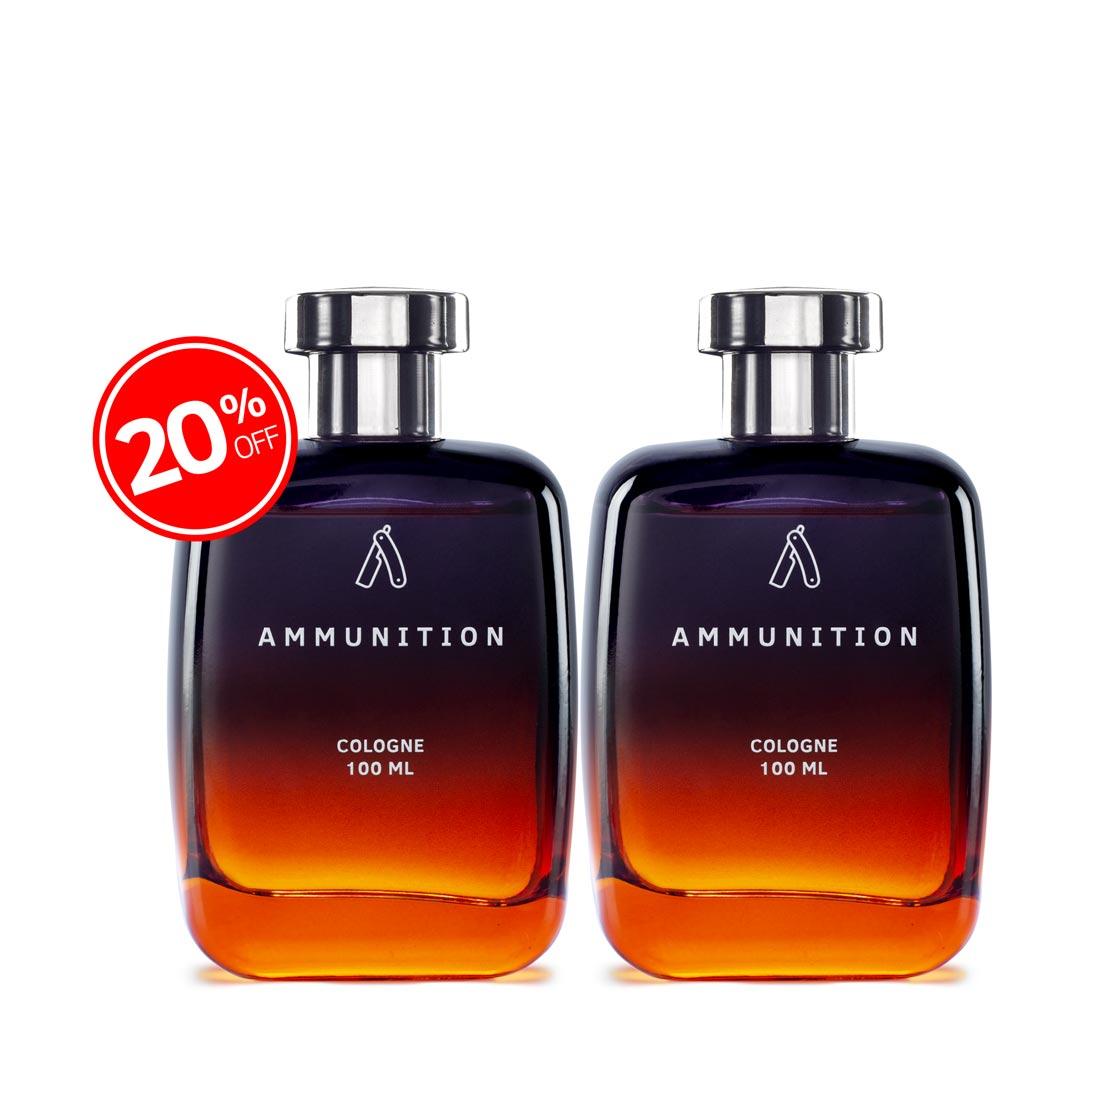 Fragrance Bundle - Ammunition